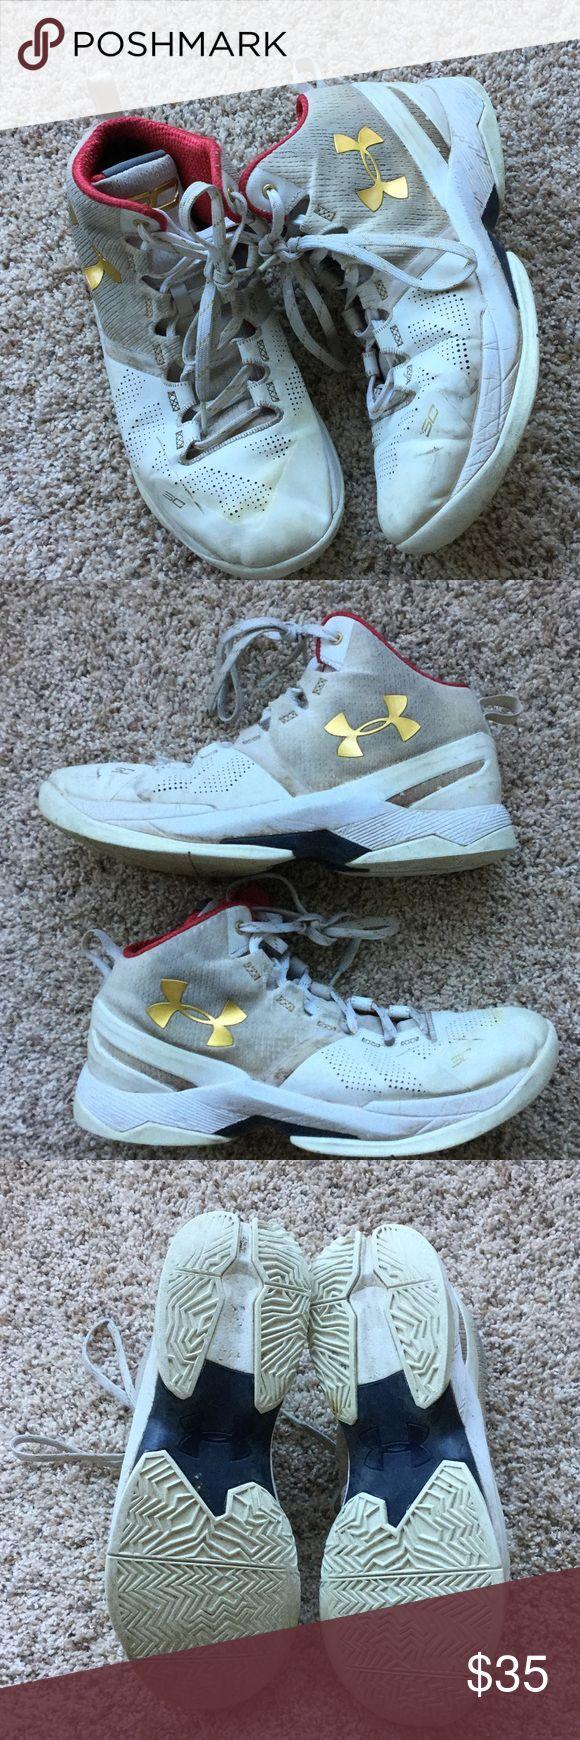 stephen curry jordan shoes nike terminator